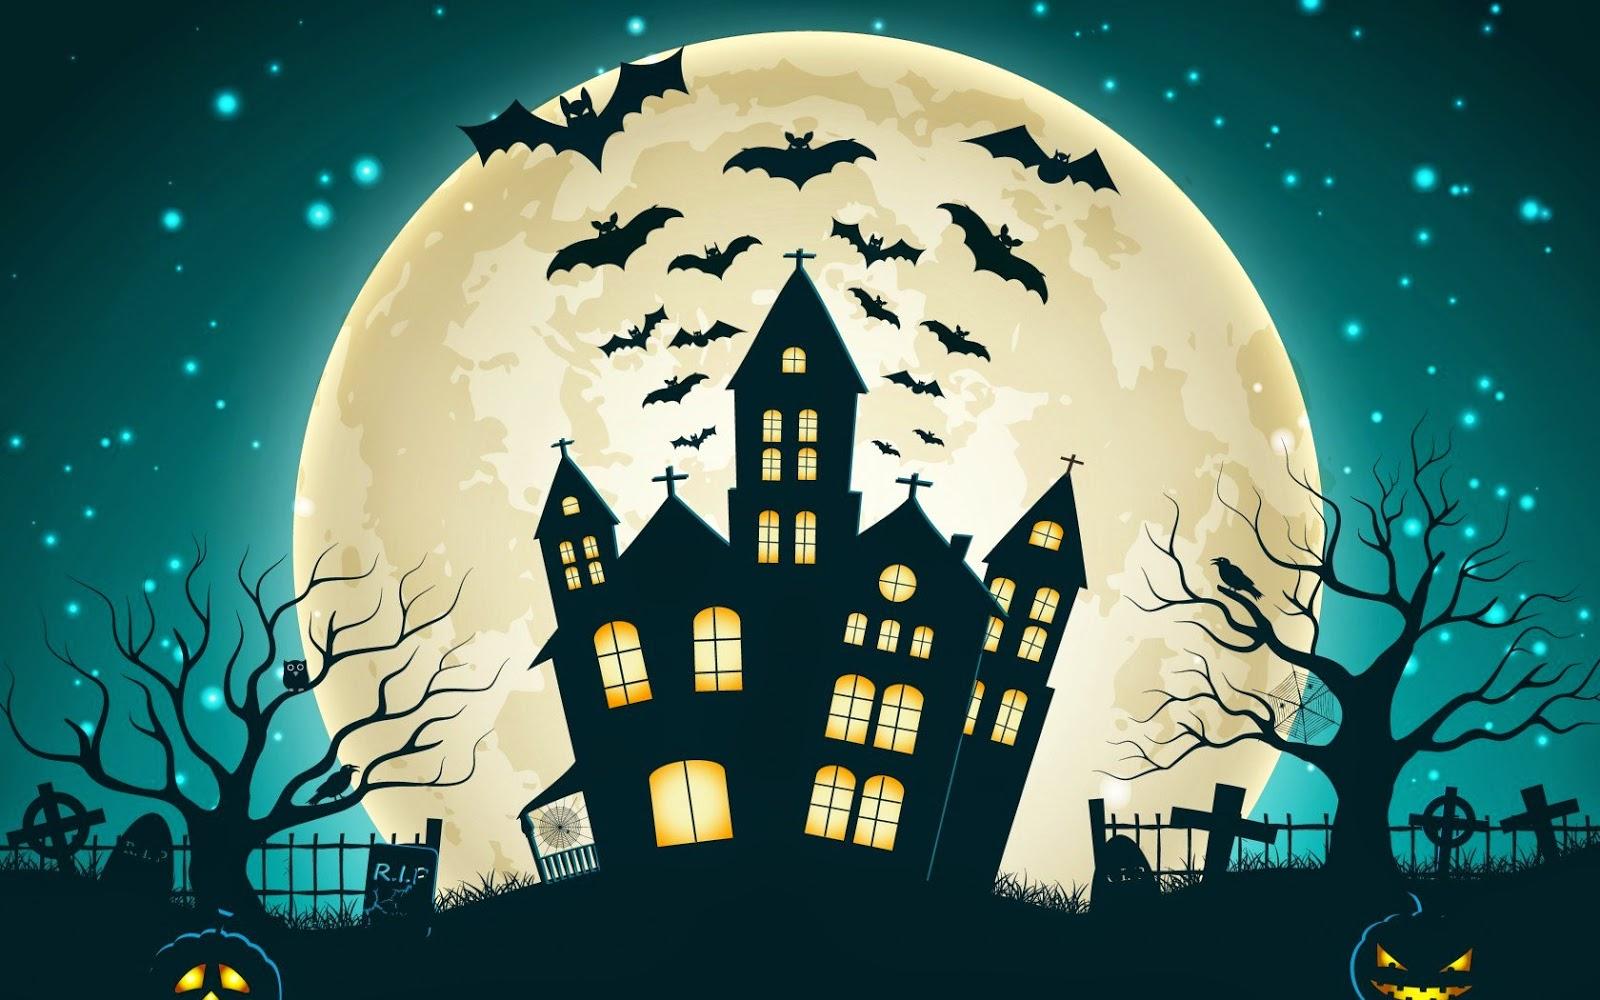 Happy halloween 2014 beautiful wallpapers collection 2014 - Funny happy halloween wallpaper ...